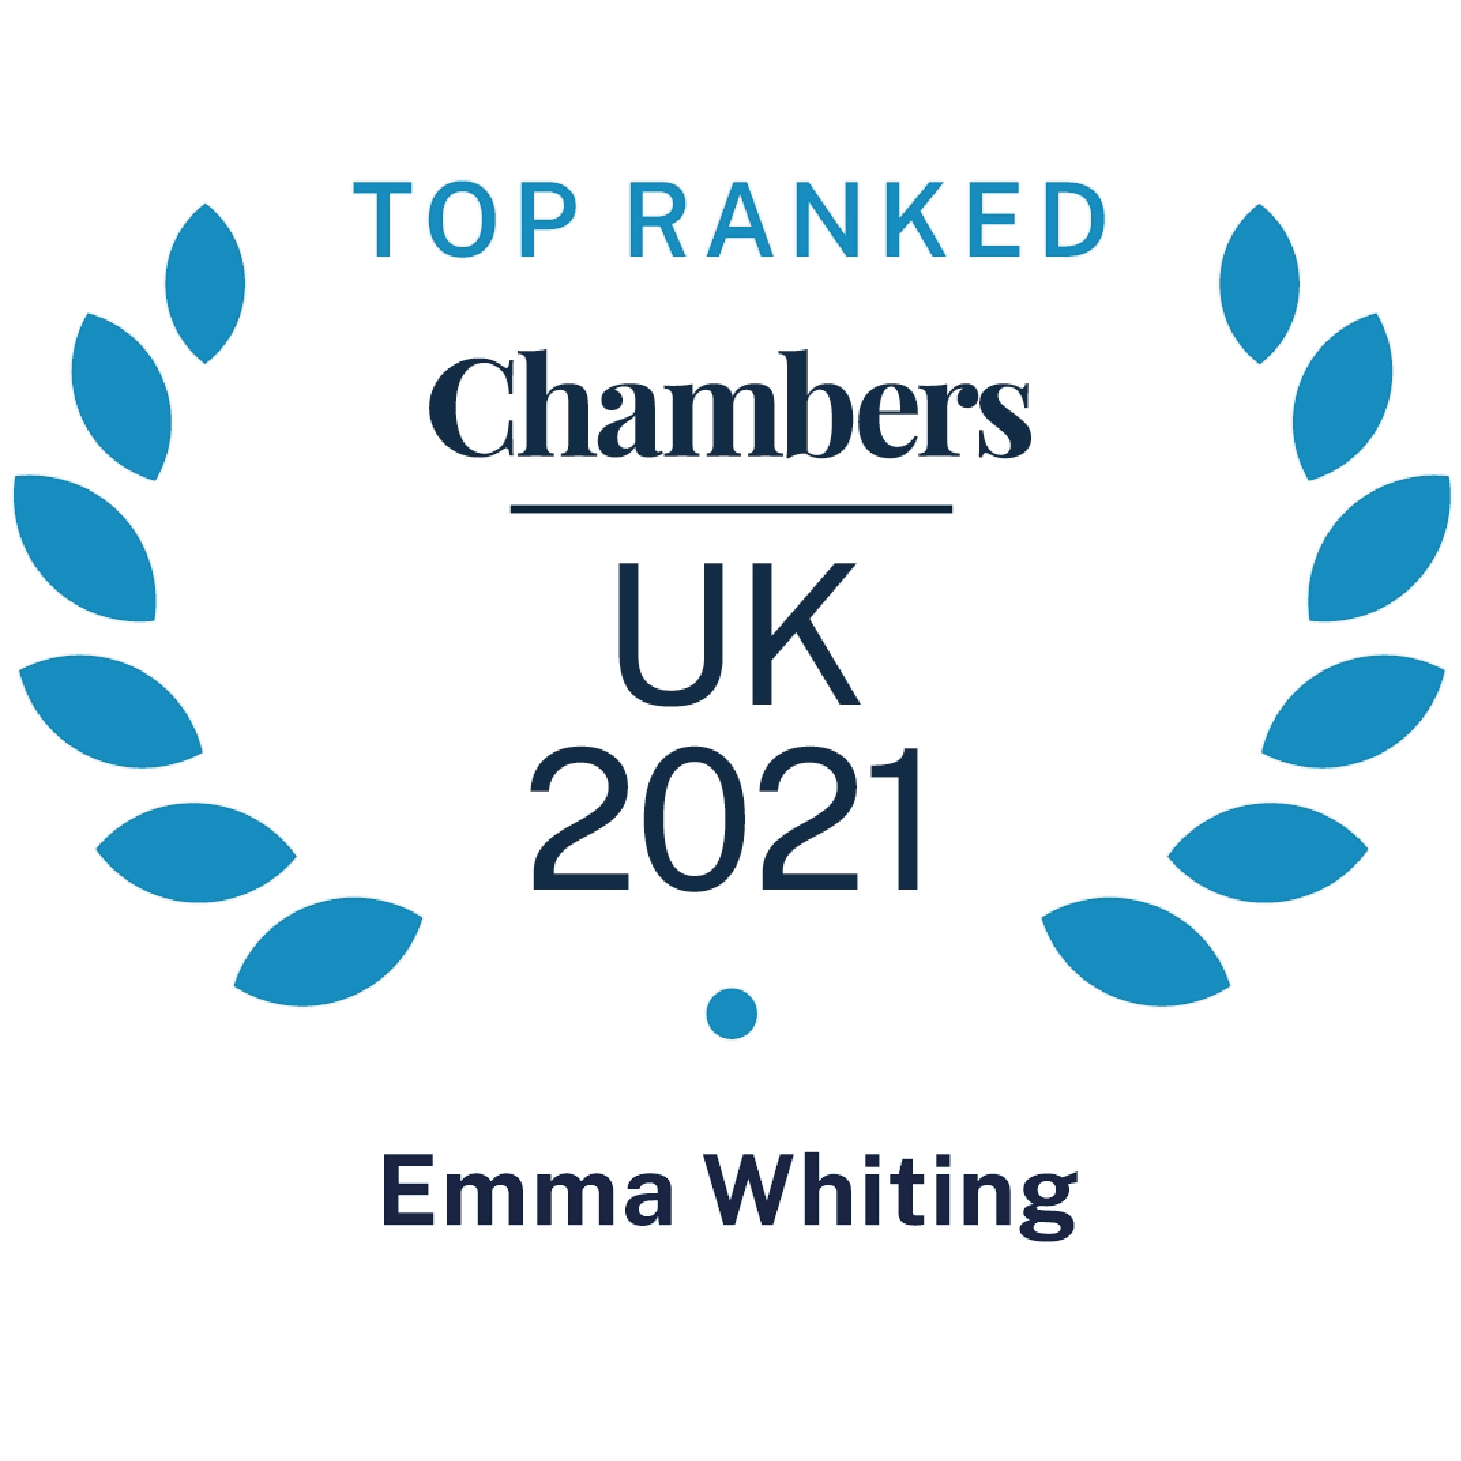 Chambers Top Ranked UK 2021